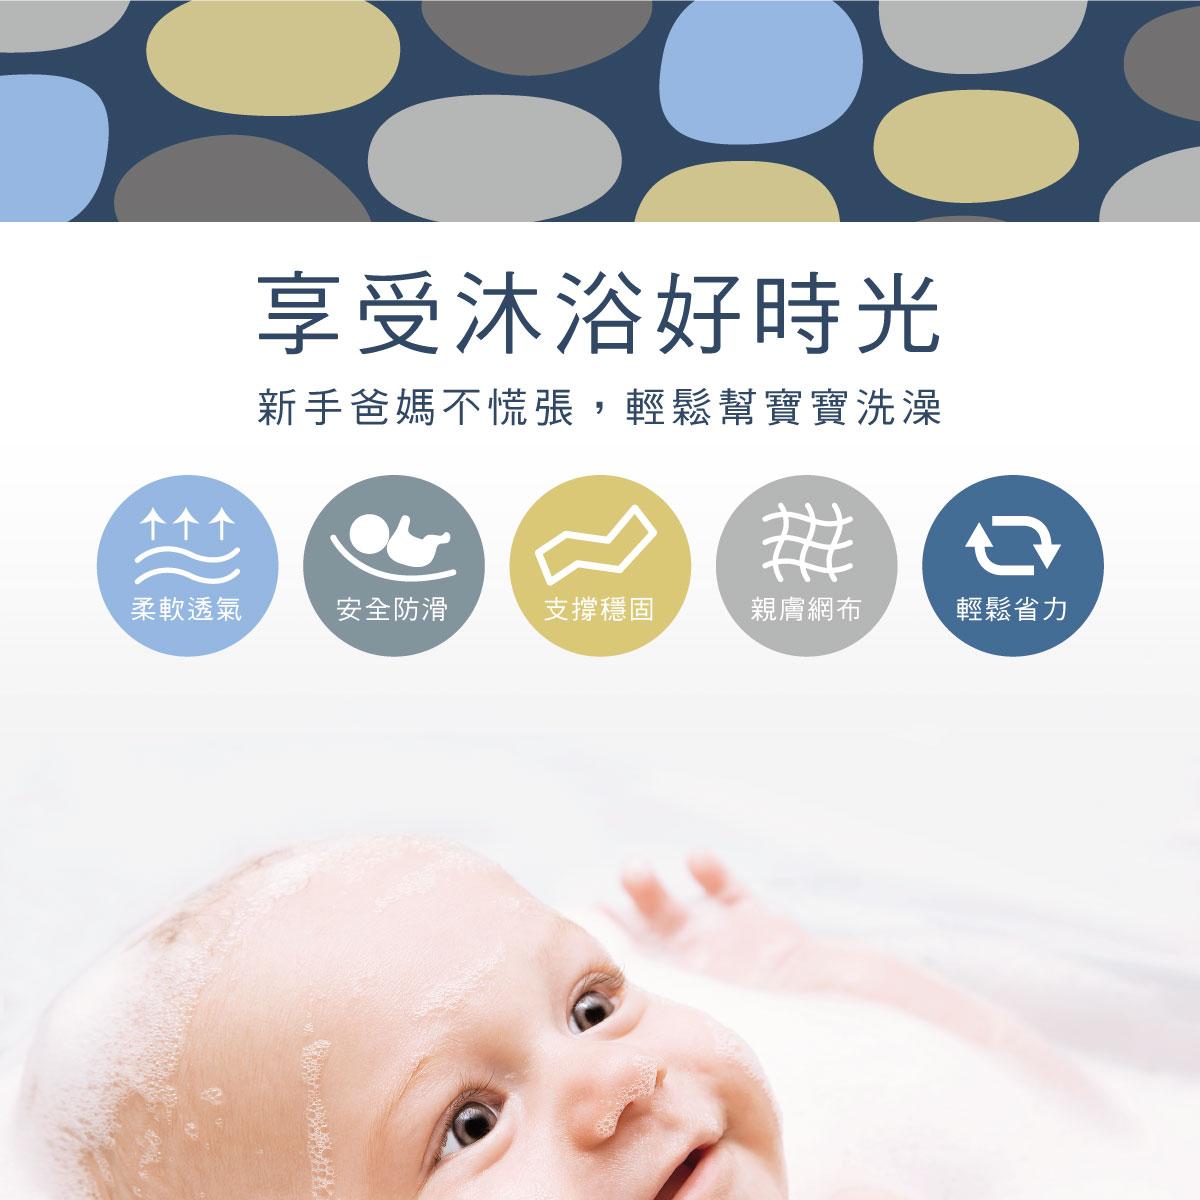 proimages/Bathing&CleanSeries/Bathing/BabyBathTub/1133/1133-成長印記沐浴床-EDM-1.jpg